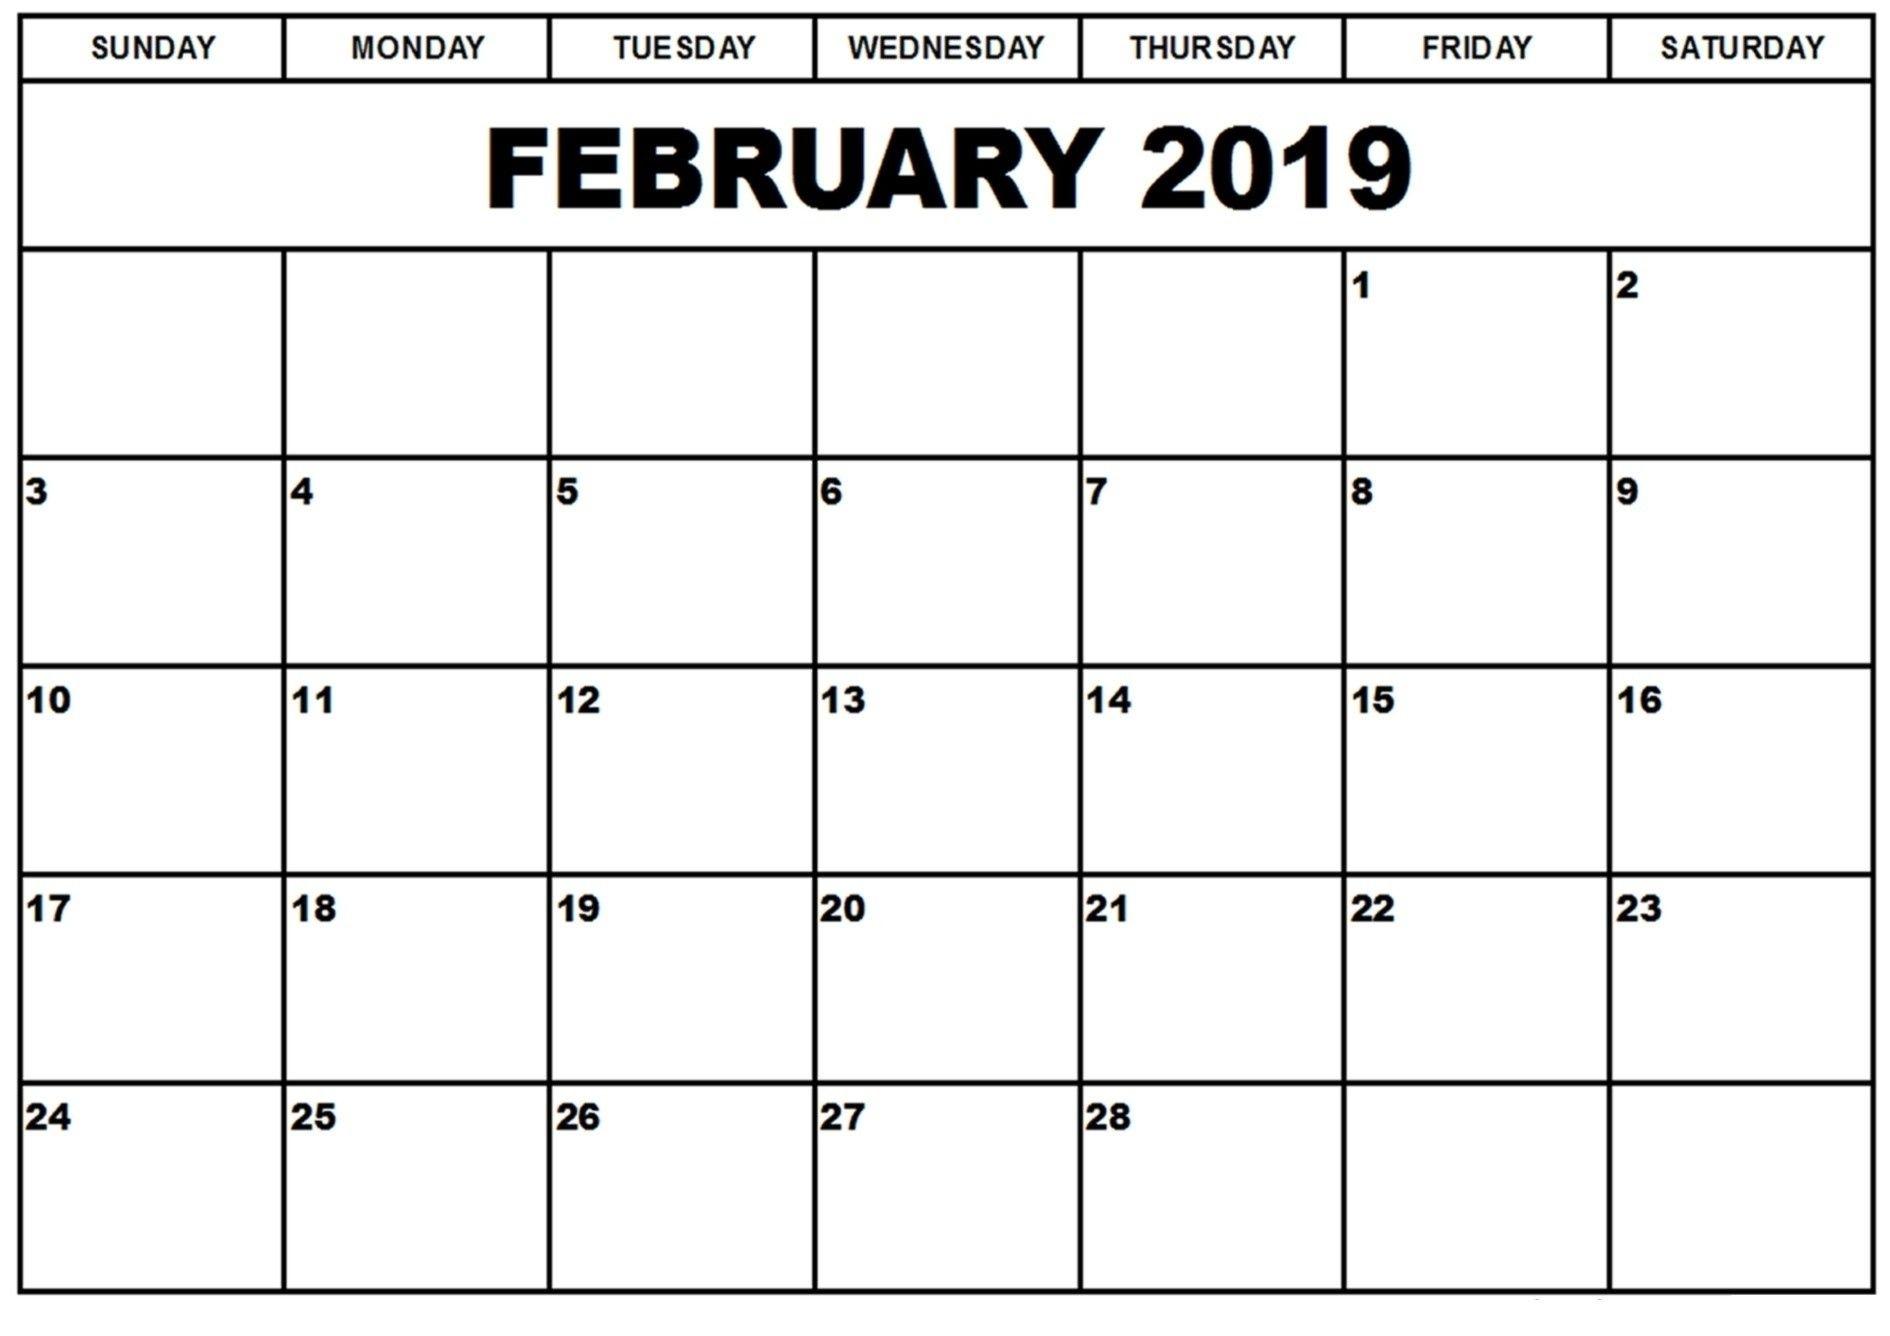 Calendar Template Date And Time In 2020 | Editable Calendar